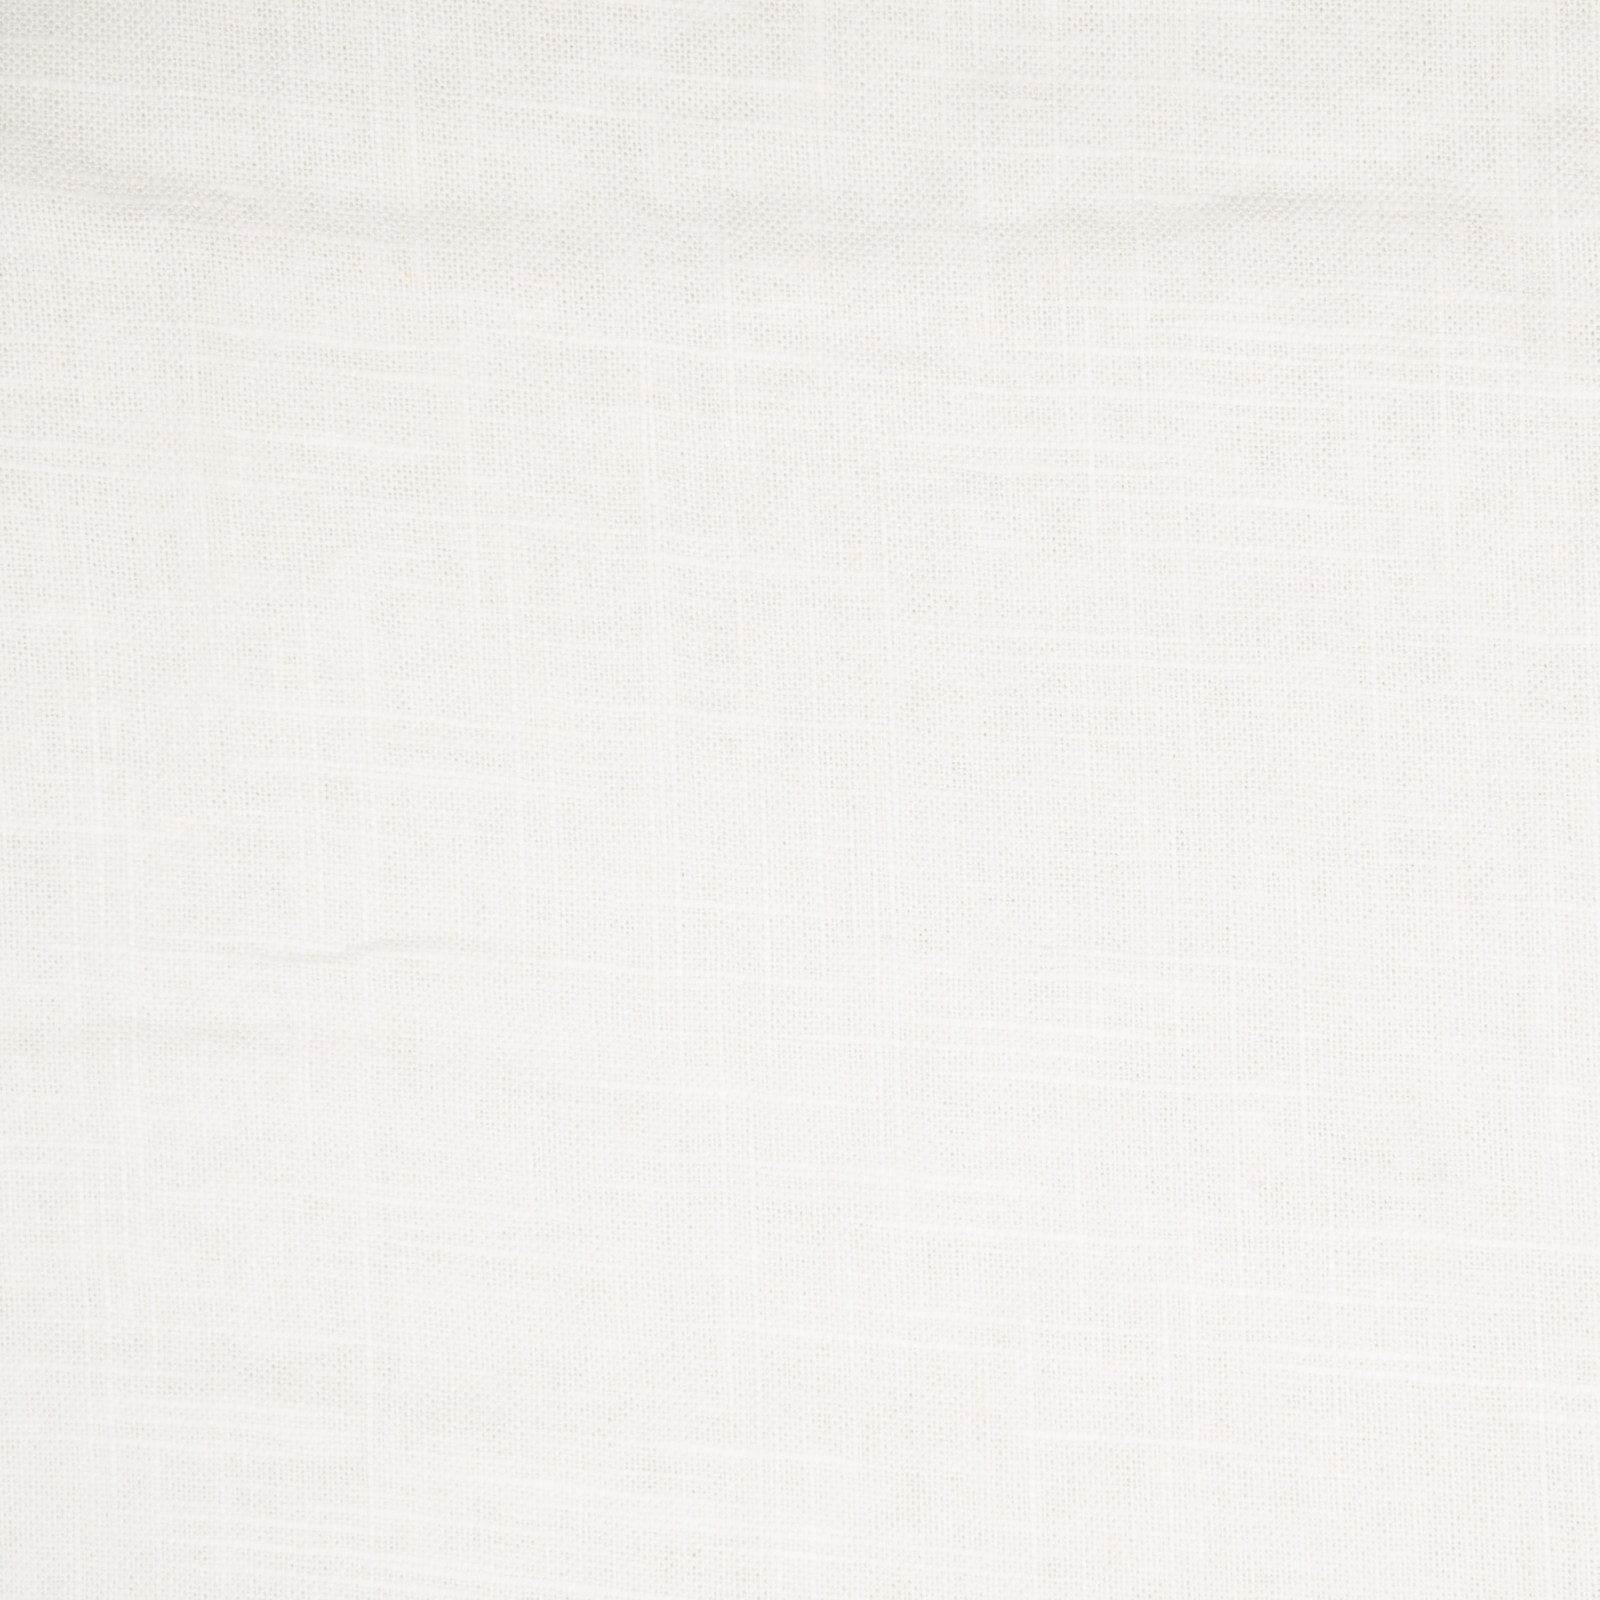 B4000 Optic White Greenhouse Fabrics